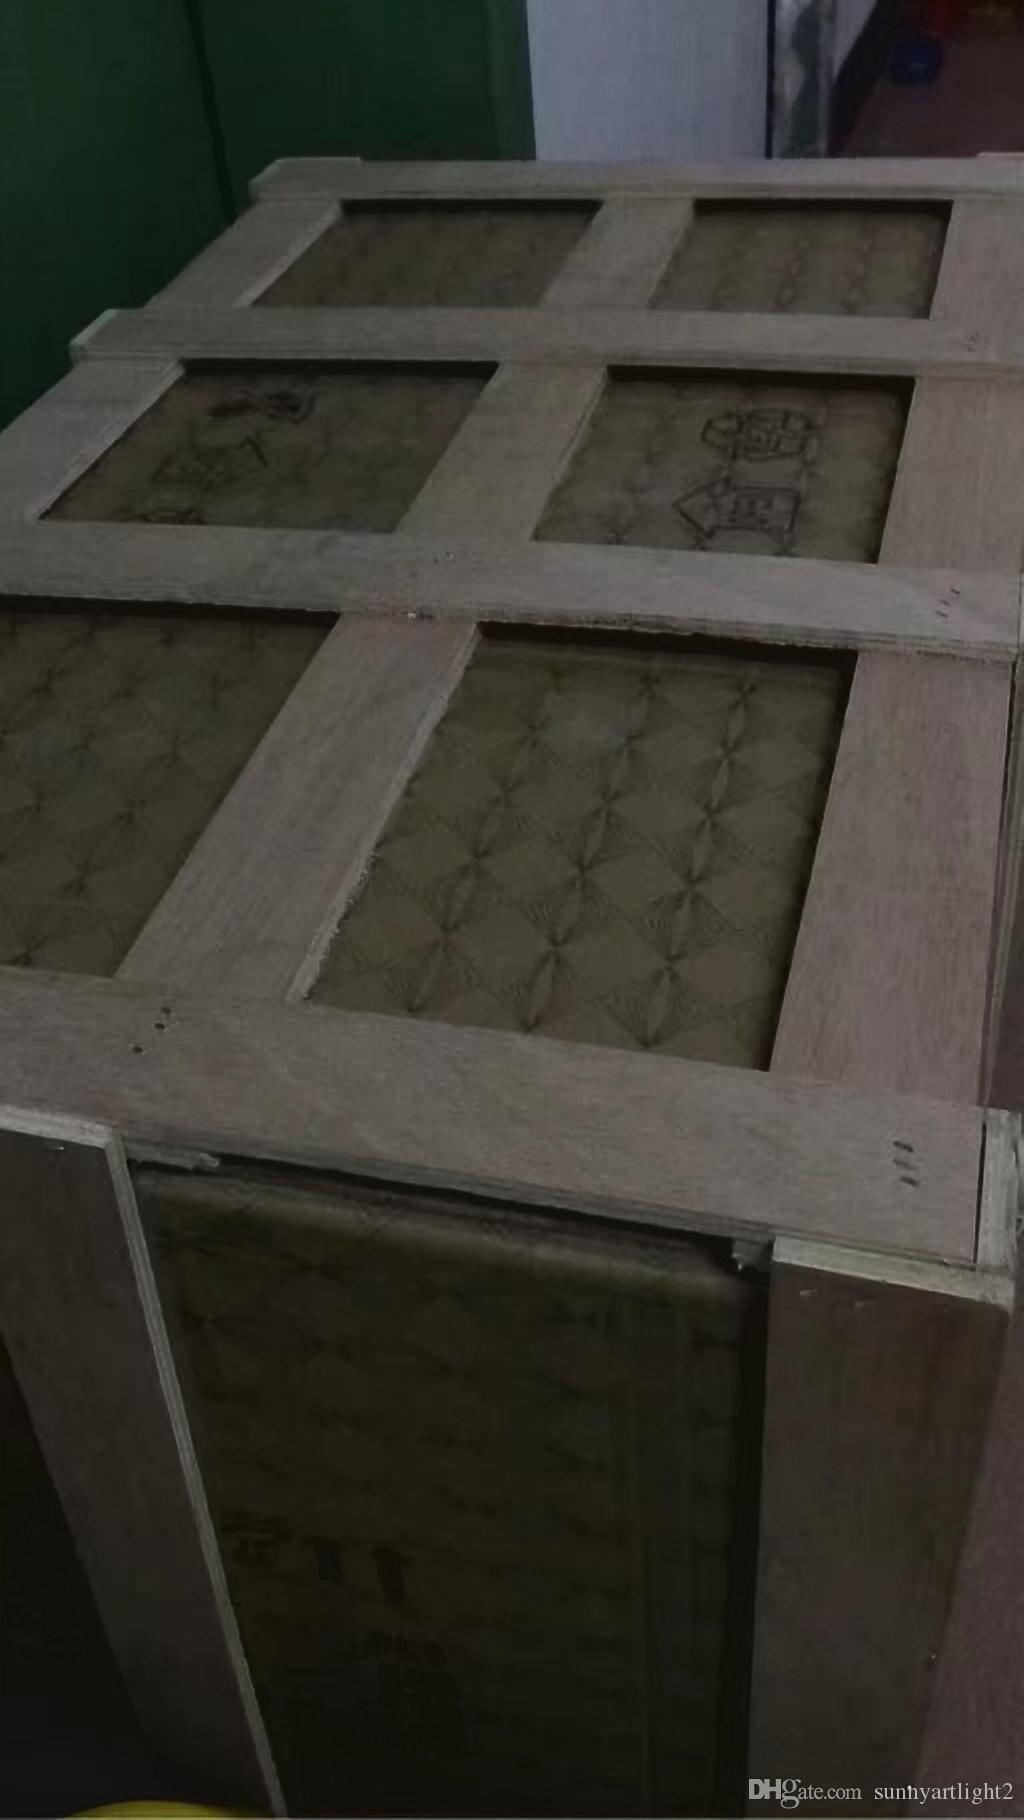 Novo Design colorido Murano vidro borosilicato Candelabro Lâmpadas 100% artesanal de alta qualidade Art Crafts Led teto